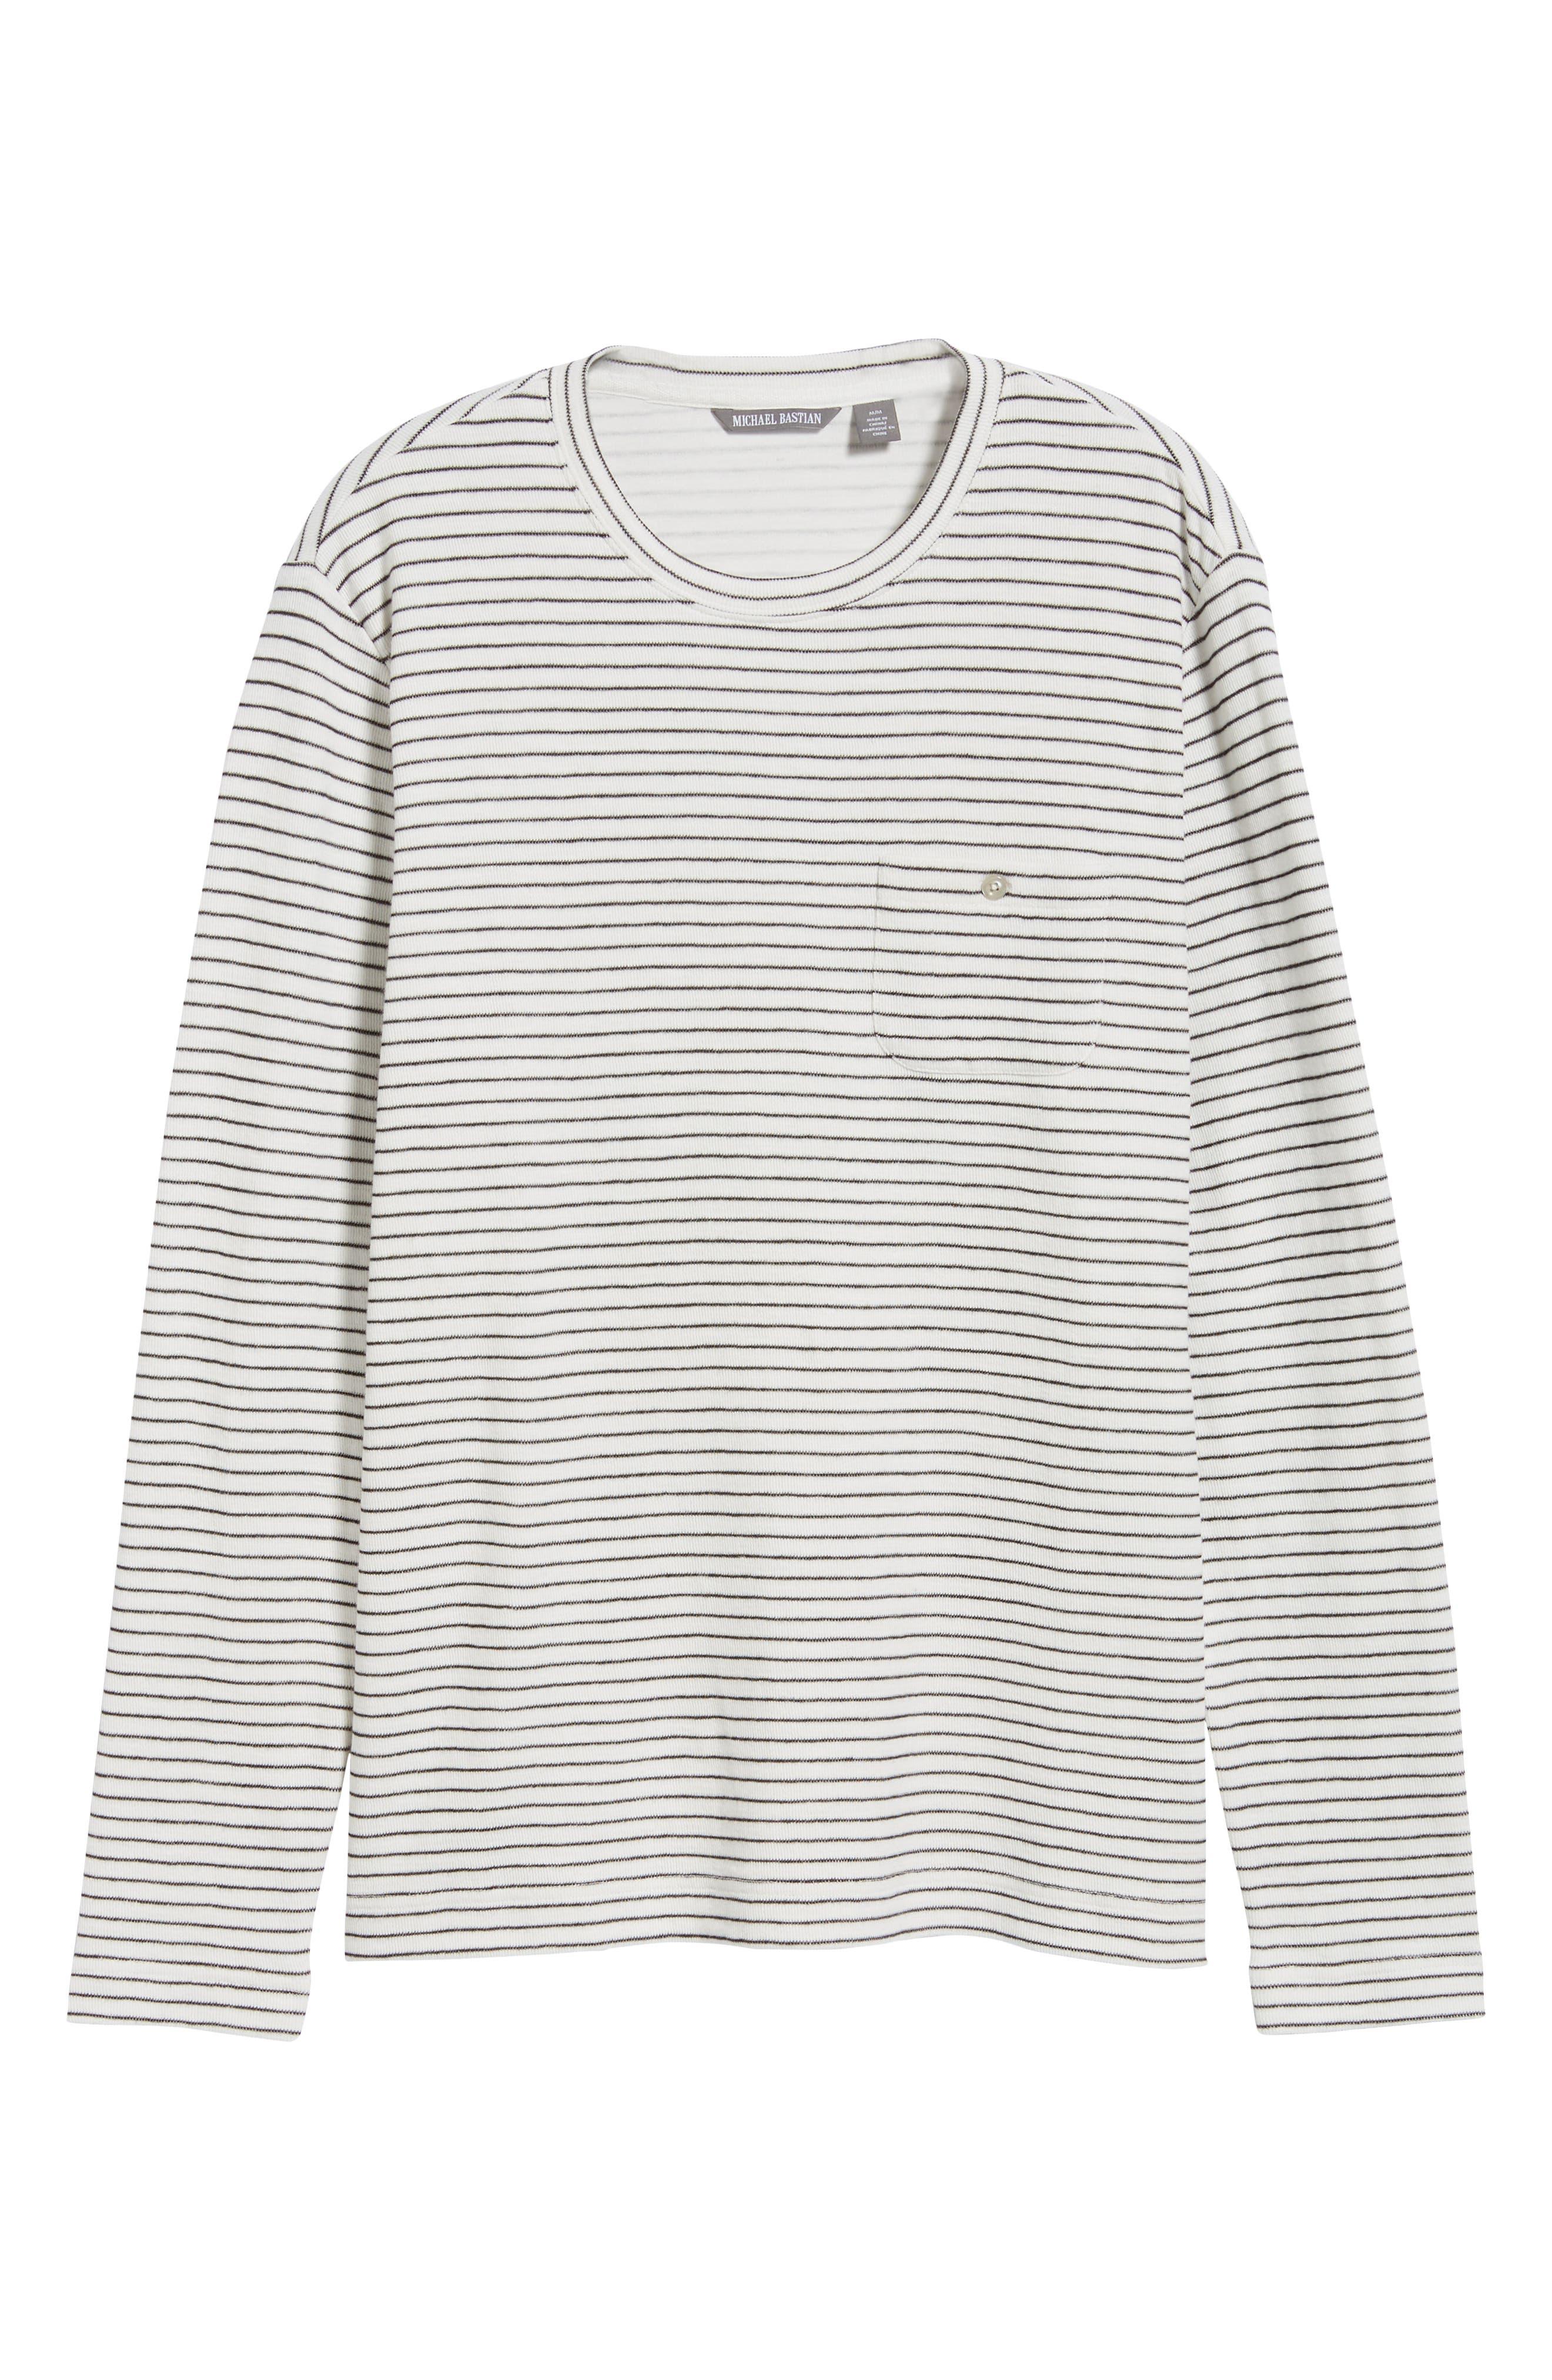 Stripe Long Sleeve Pocket T-Shirt,                             Alternate thumbnail 6, color,                             NATURAL